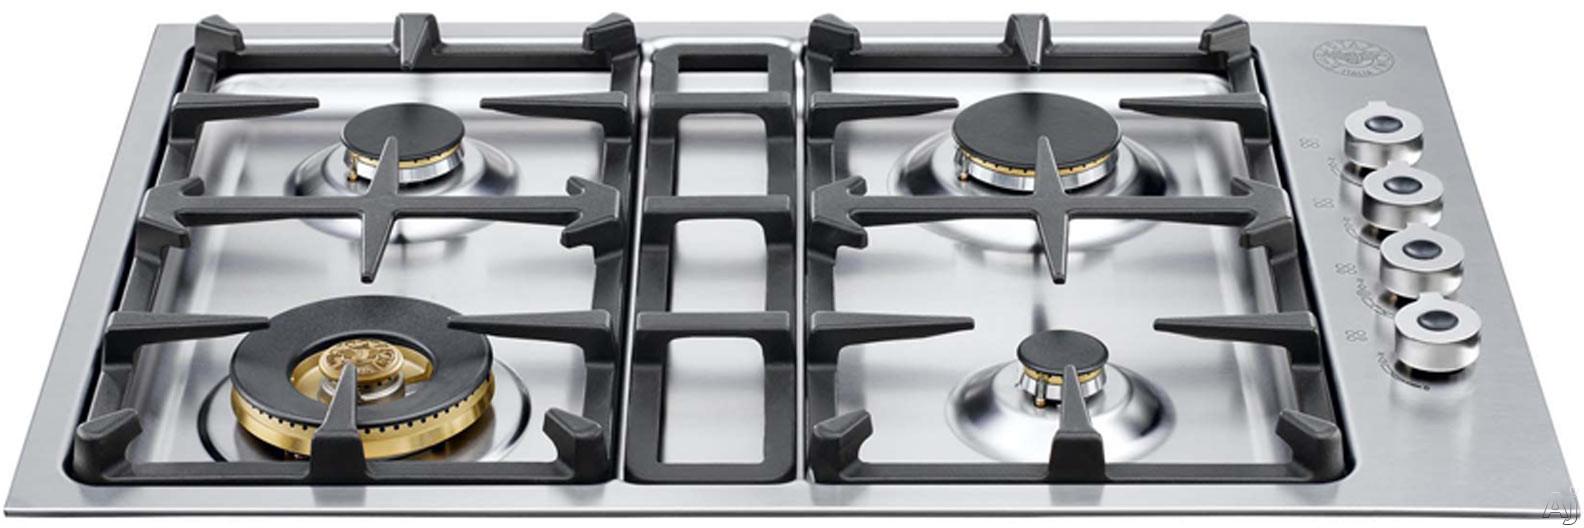 Bertazzoni Qb30400x 30 Inch Gas Cooktop